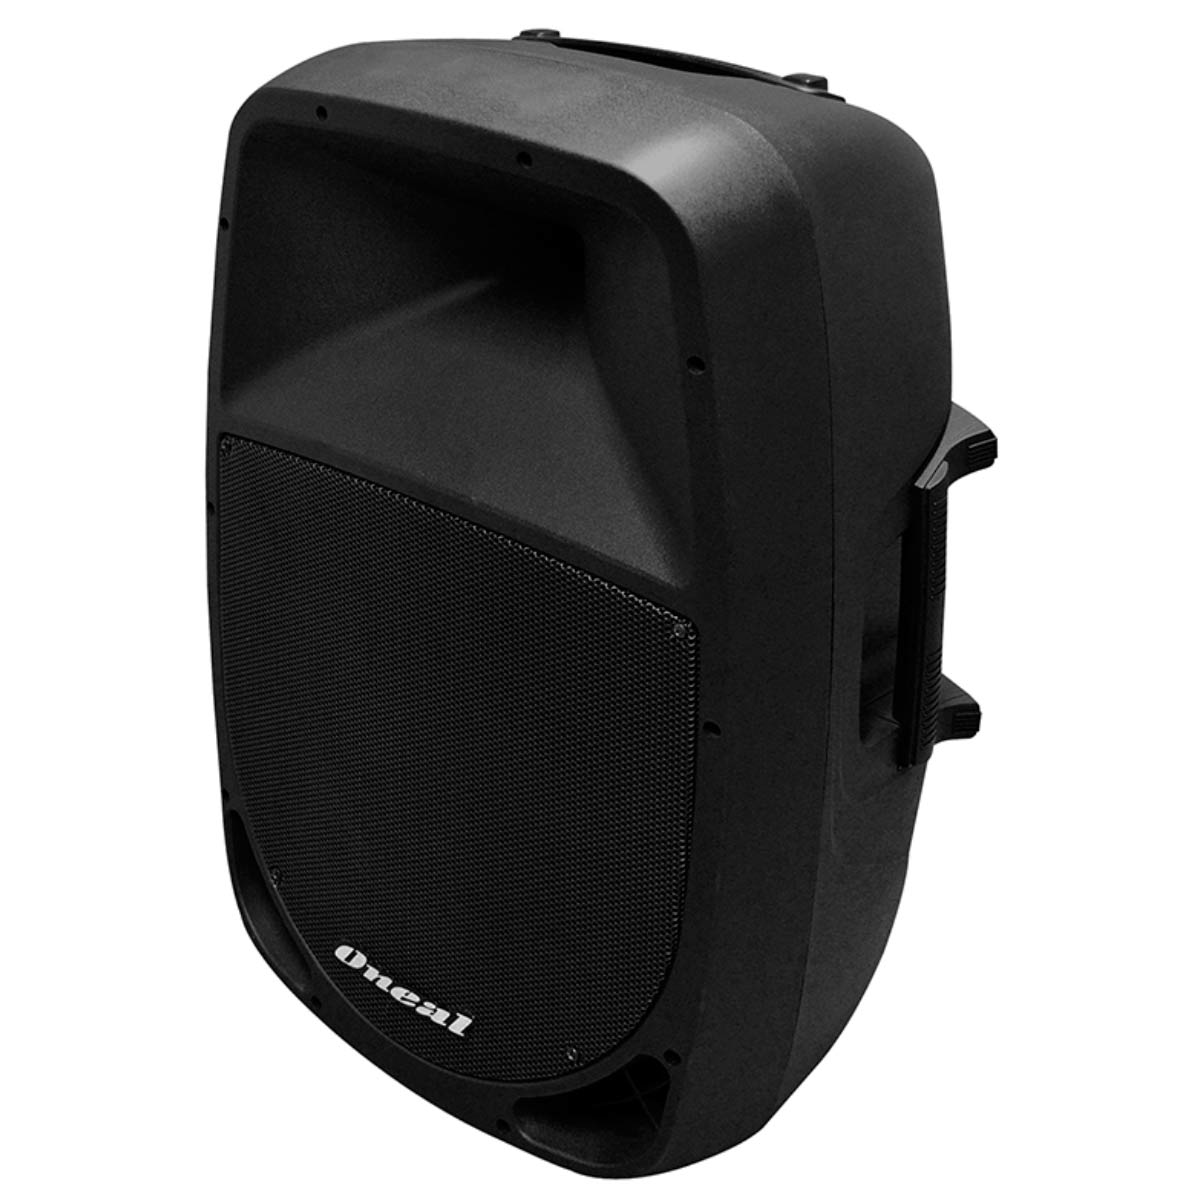 OPB1115BT - Caixa Ativa 220W c/ Bluetooth e USB OPB 1115BT - Oneal